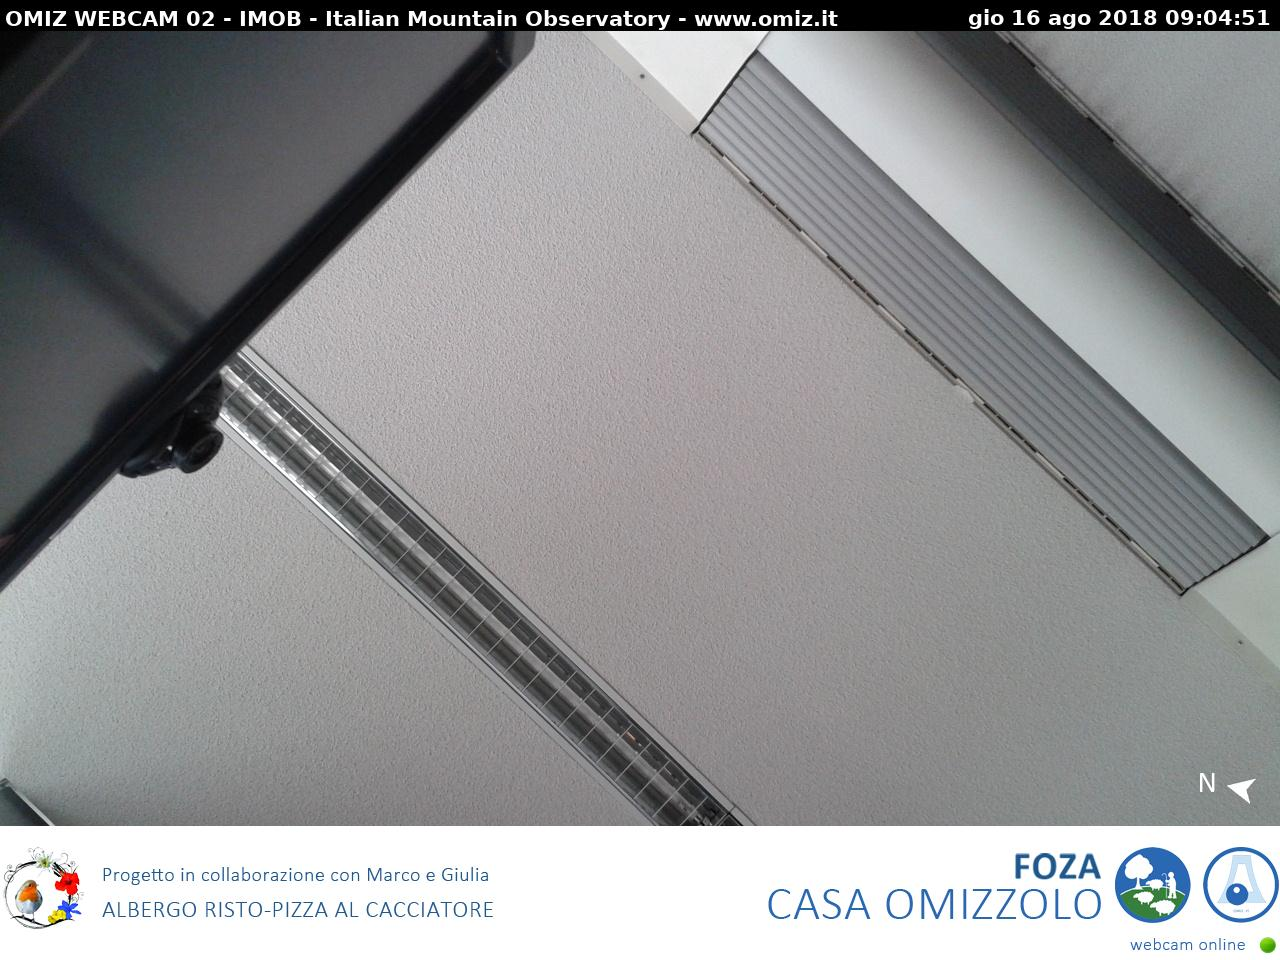 Livecam Foza 3